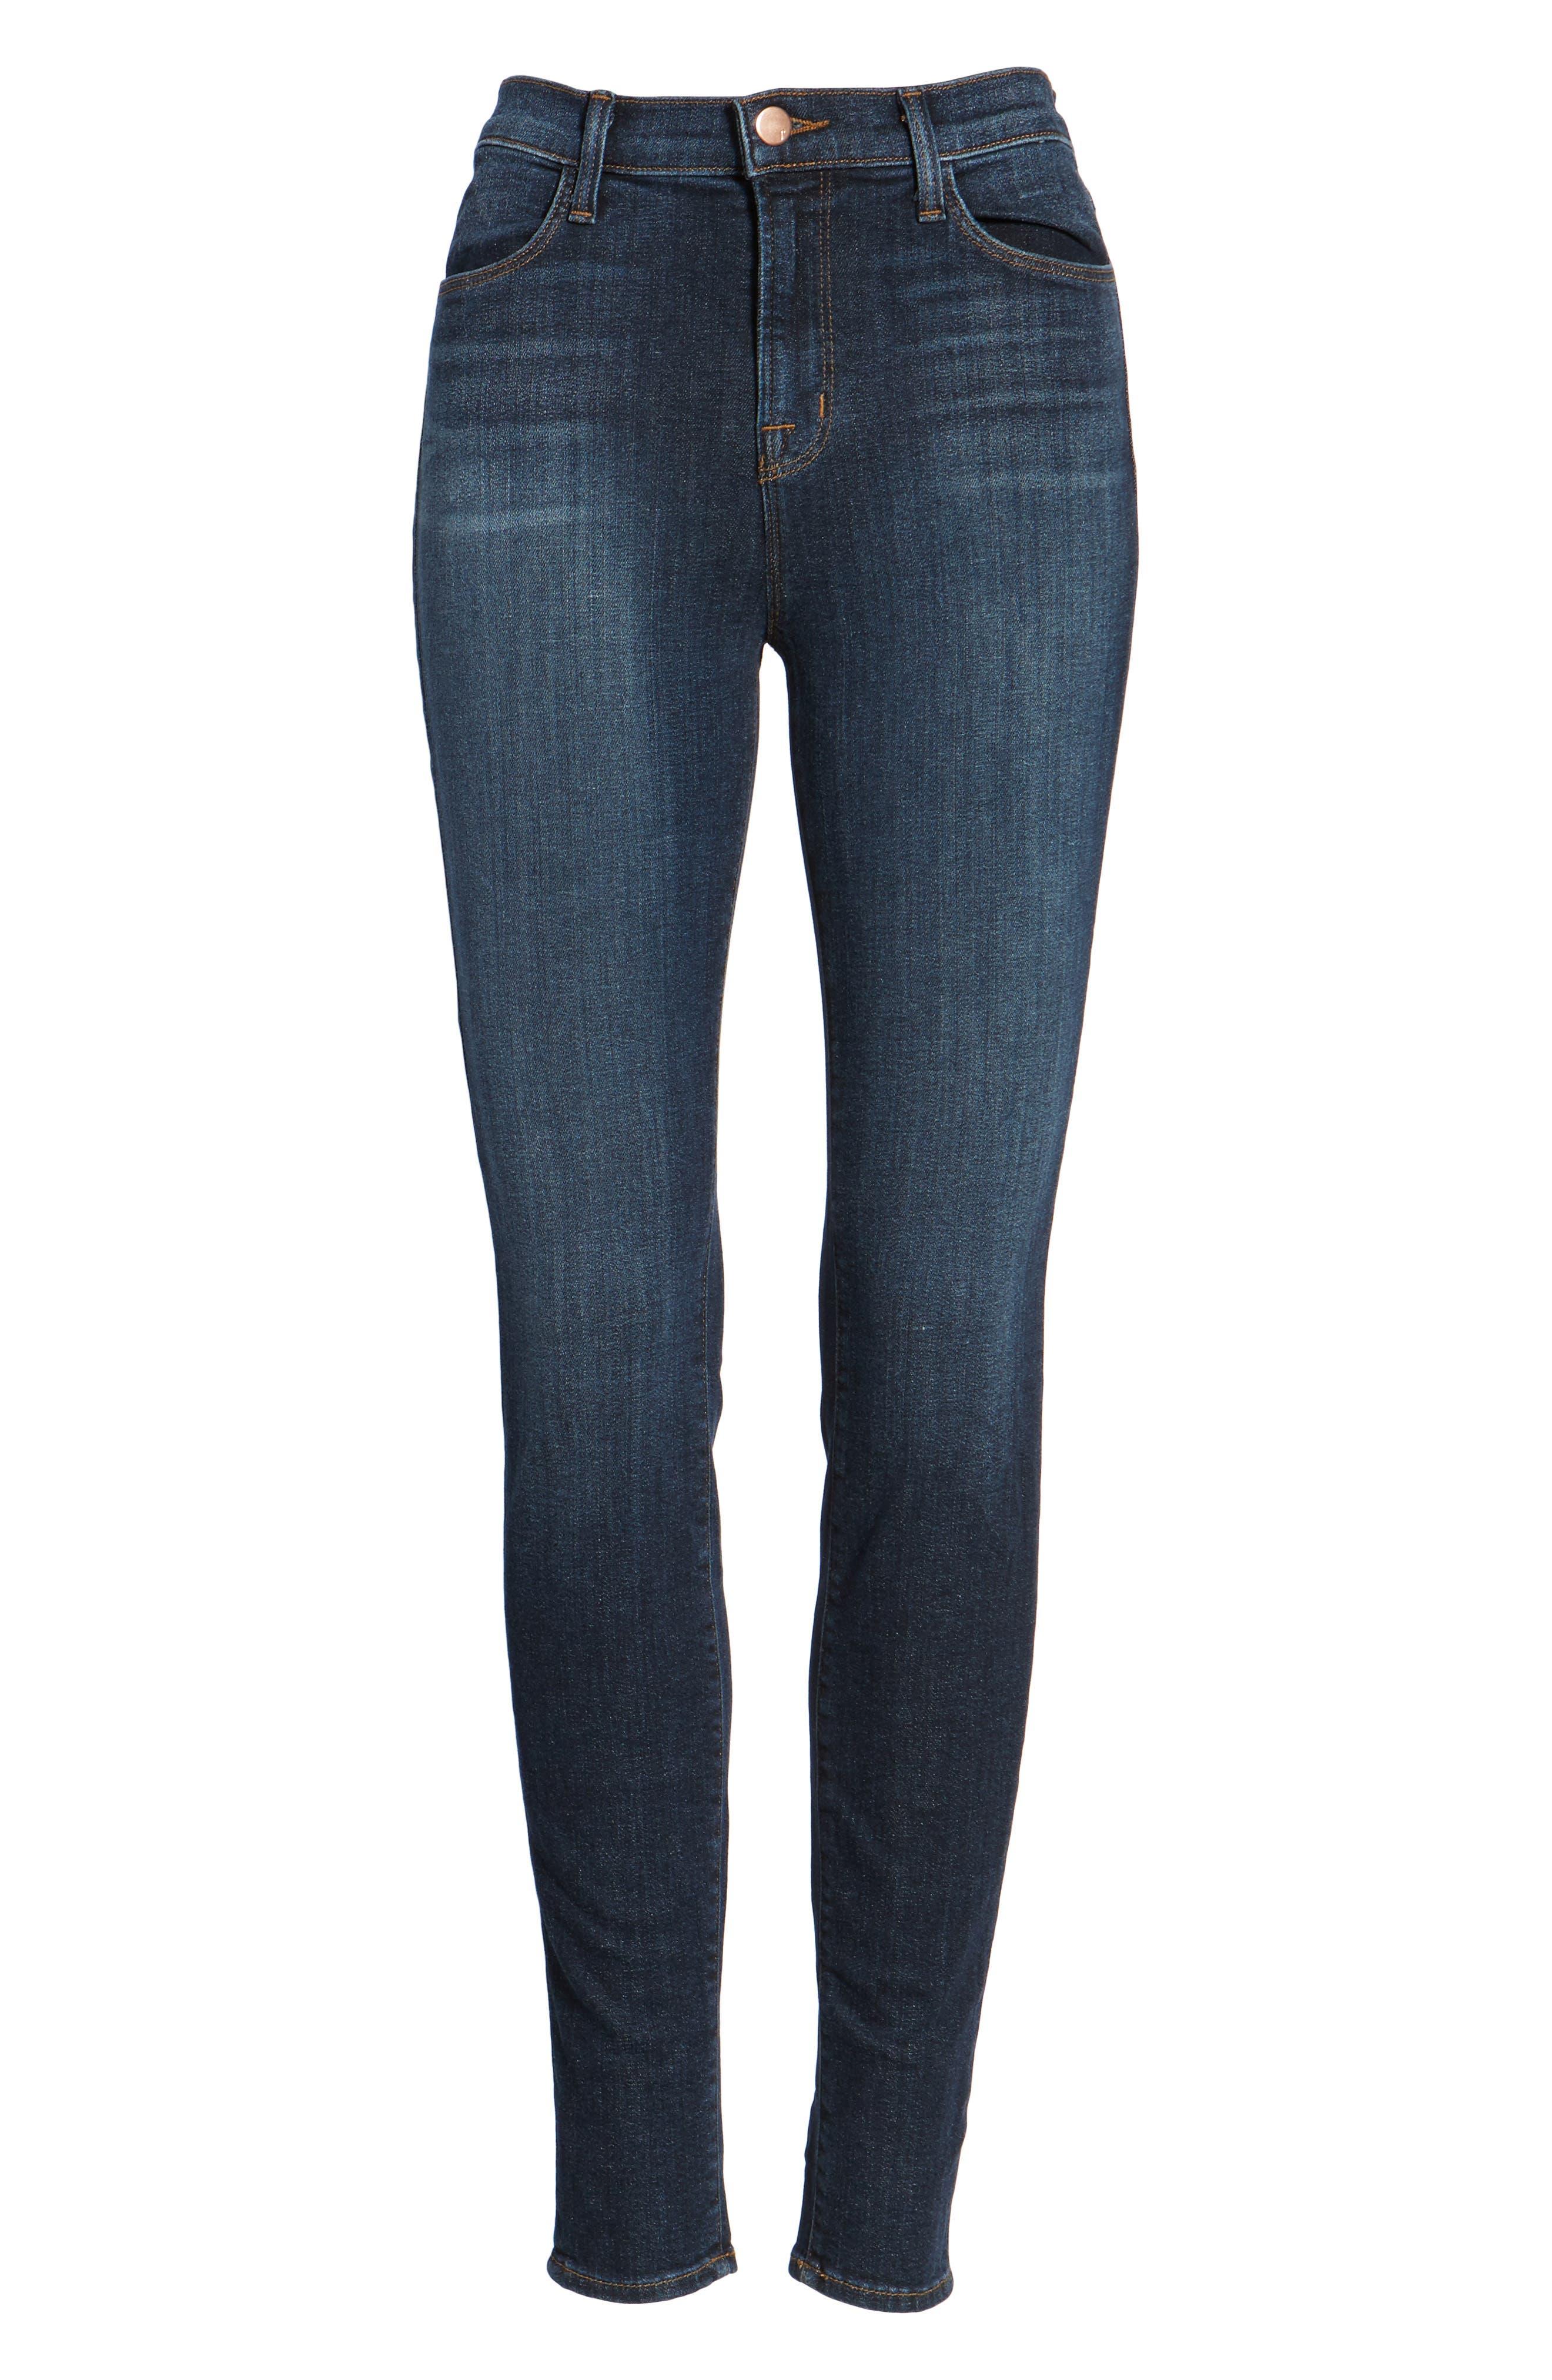 'Maria' Skinny Jeans,                             Main thumbnail 1, color,                             407